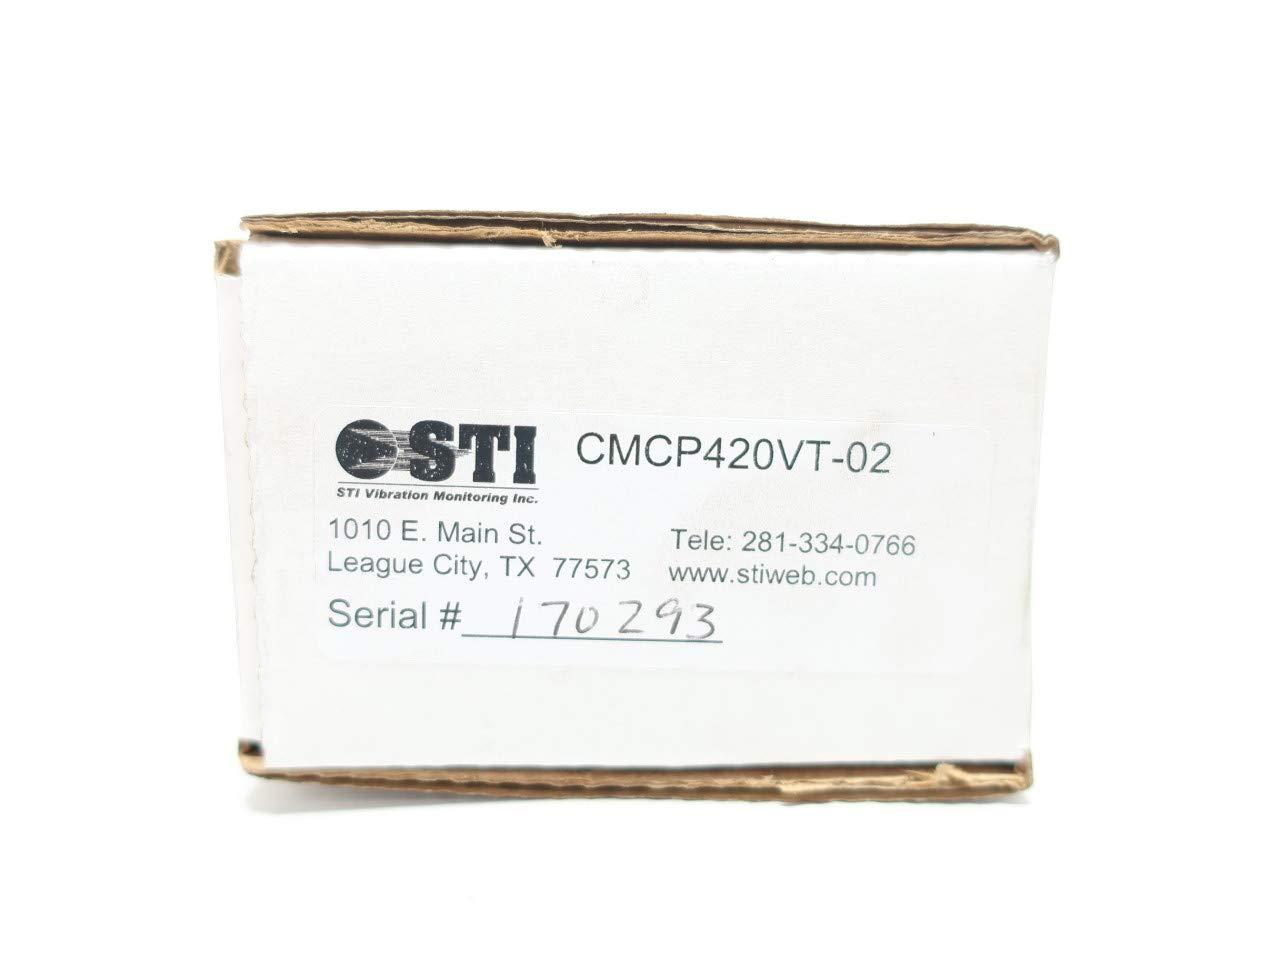 STI CMCP420VT-02 Loop Powered Velocity Transmitter Vibration Sensor 24V-DC